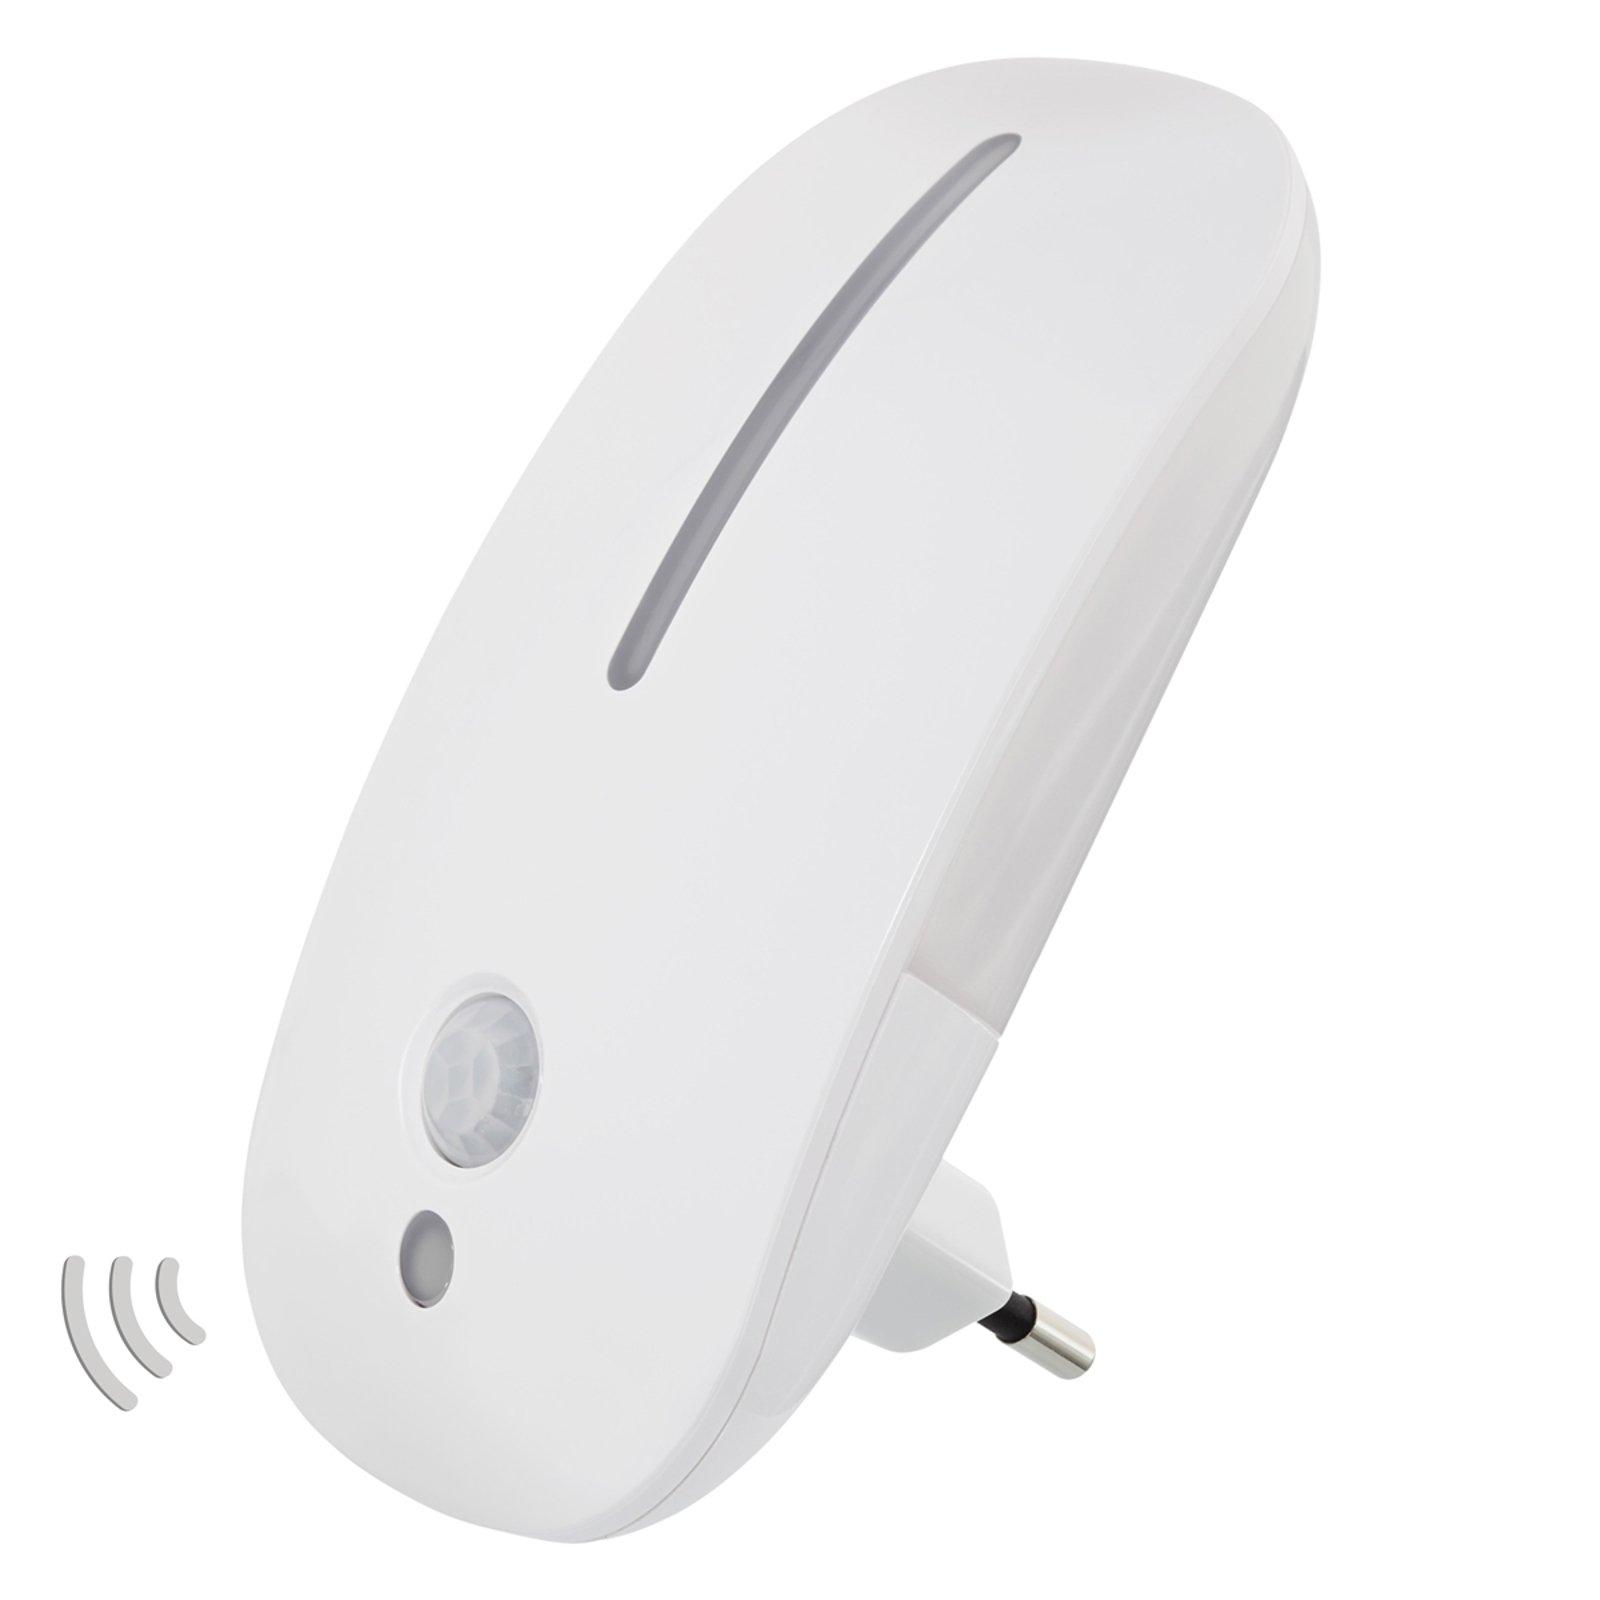 LED-sensor-nattlys Agena for stikkontakt